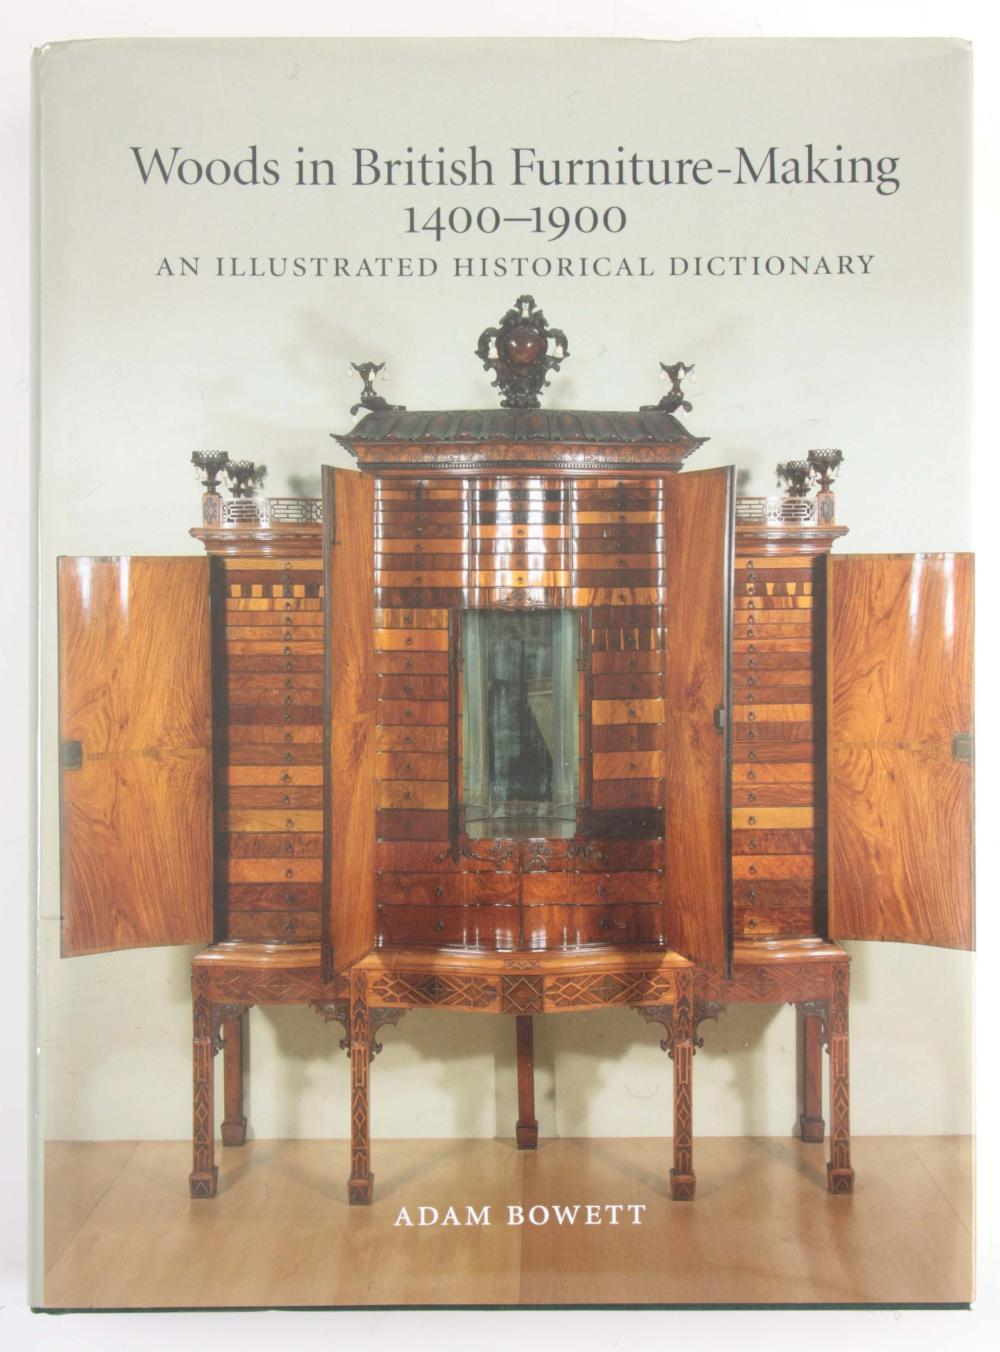 WOODS IN BRITISH FURNITURE MAKING 1400-1900 by Ada